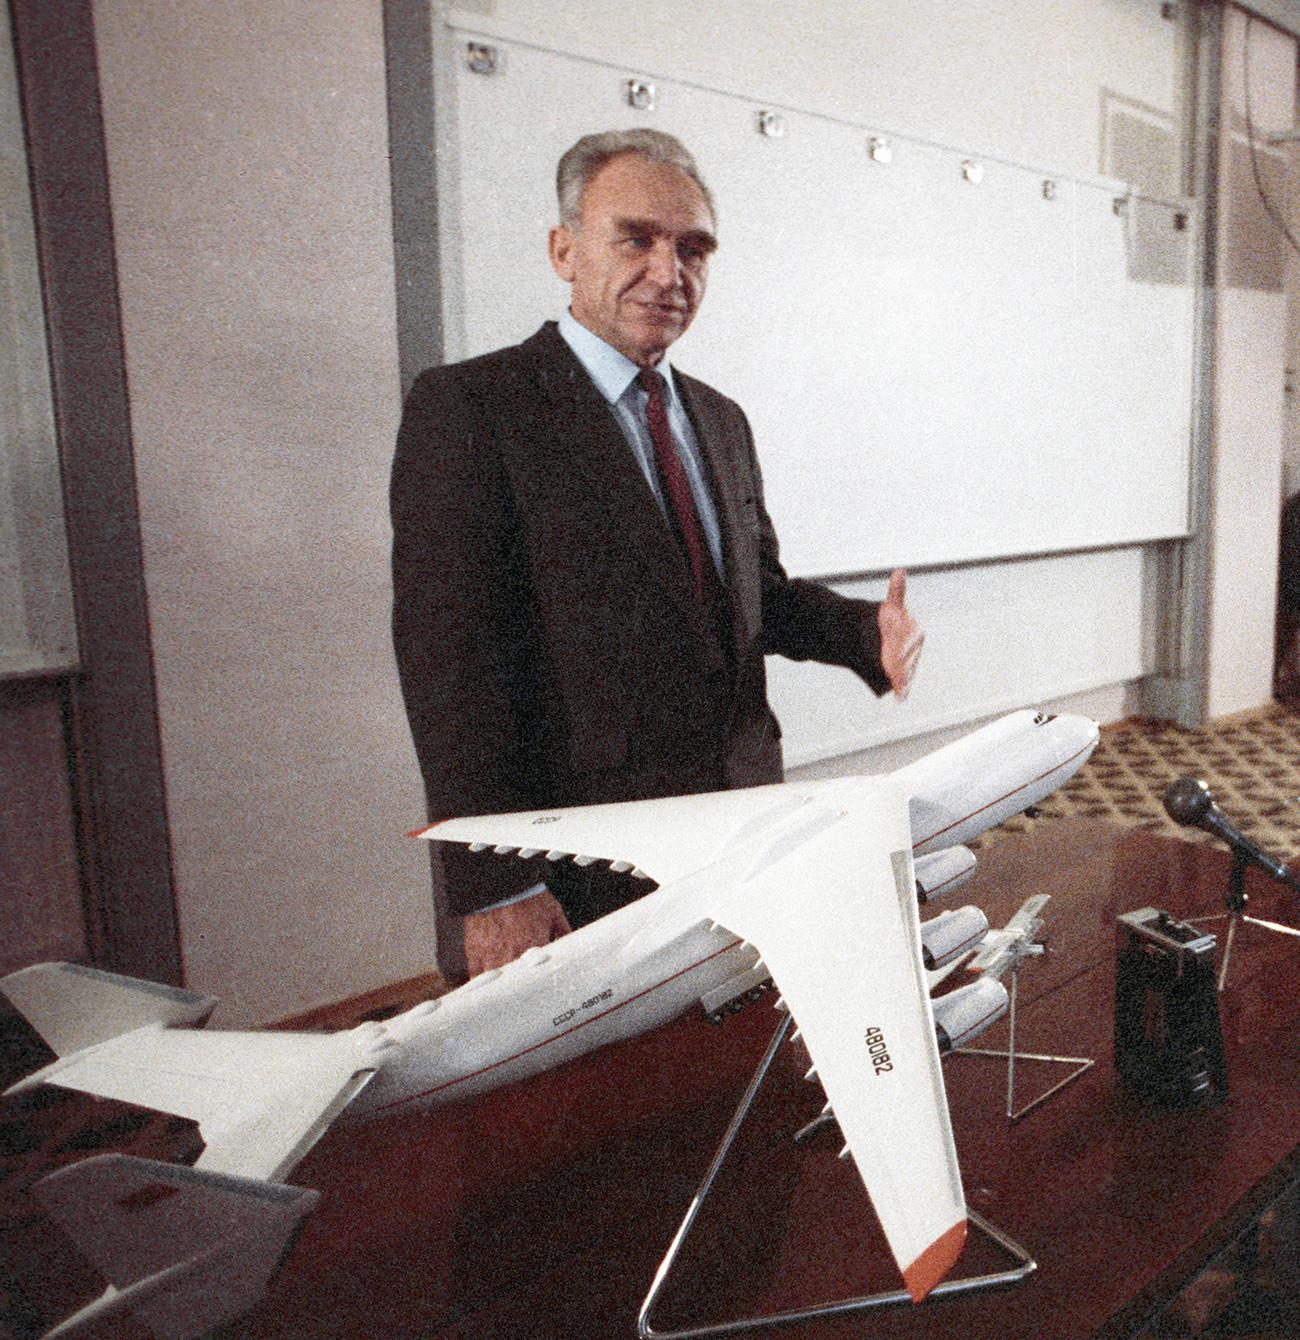 General aircraft designer Peter Balabuev